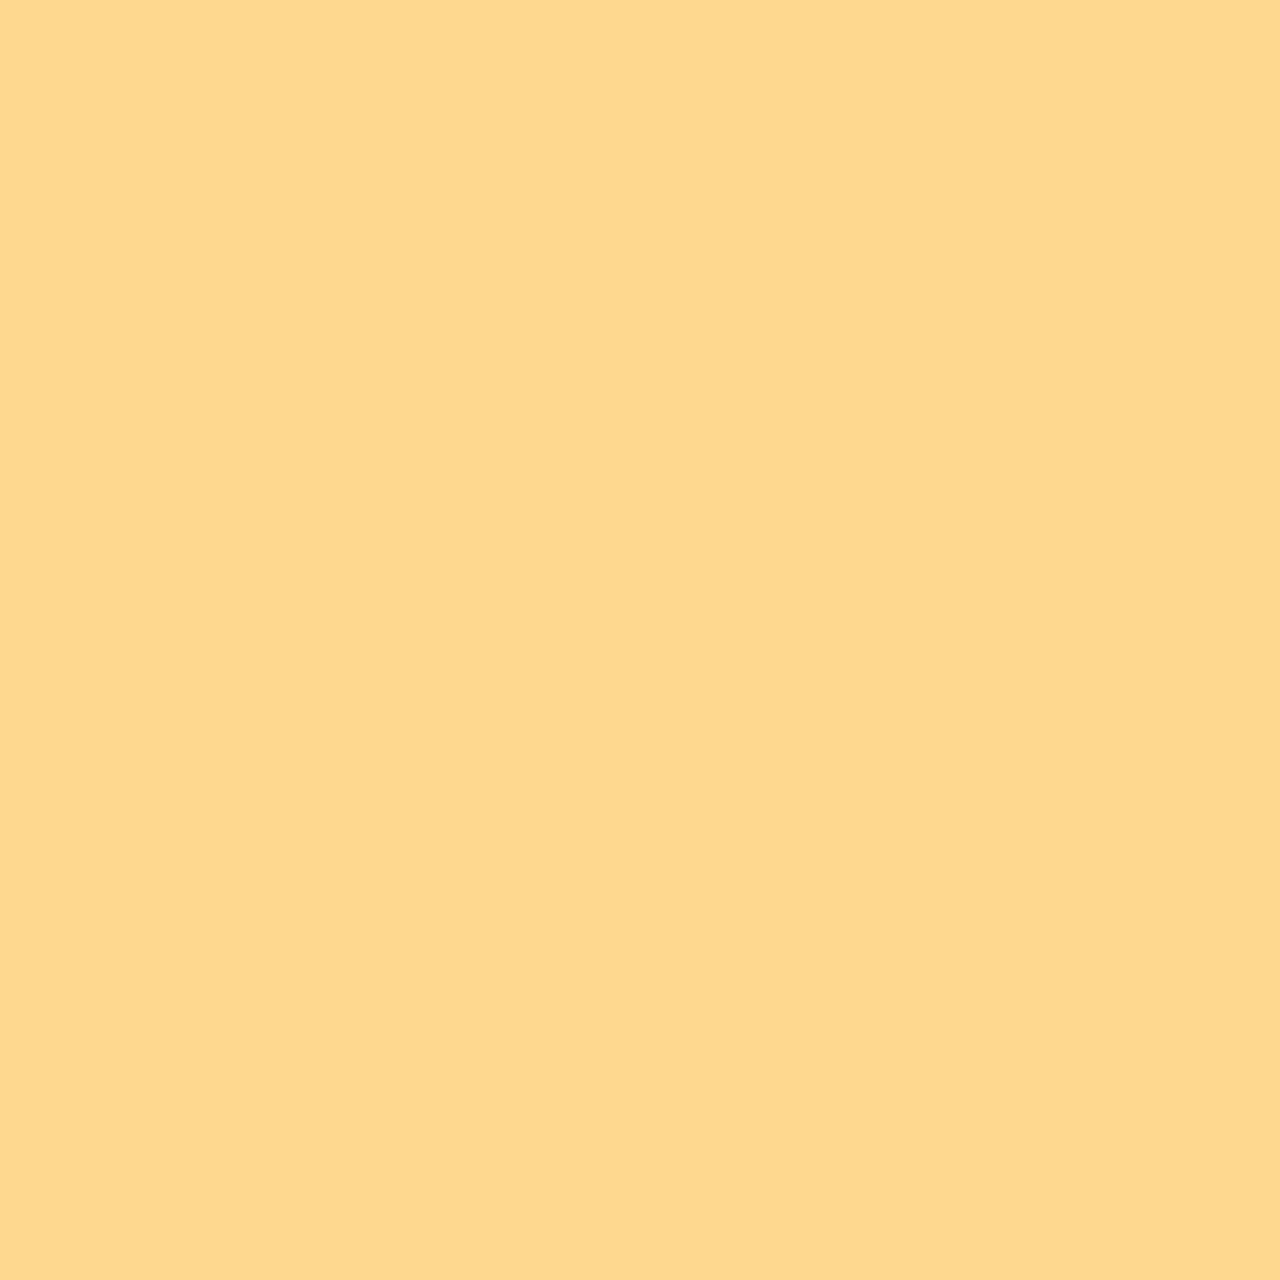 #0013 Rosco Gels Roscolux Straw Tint, 20x24